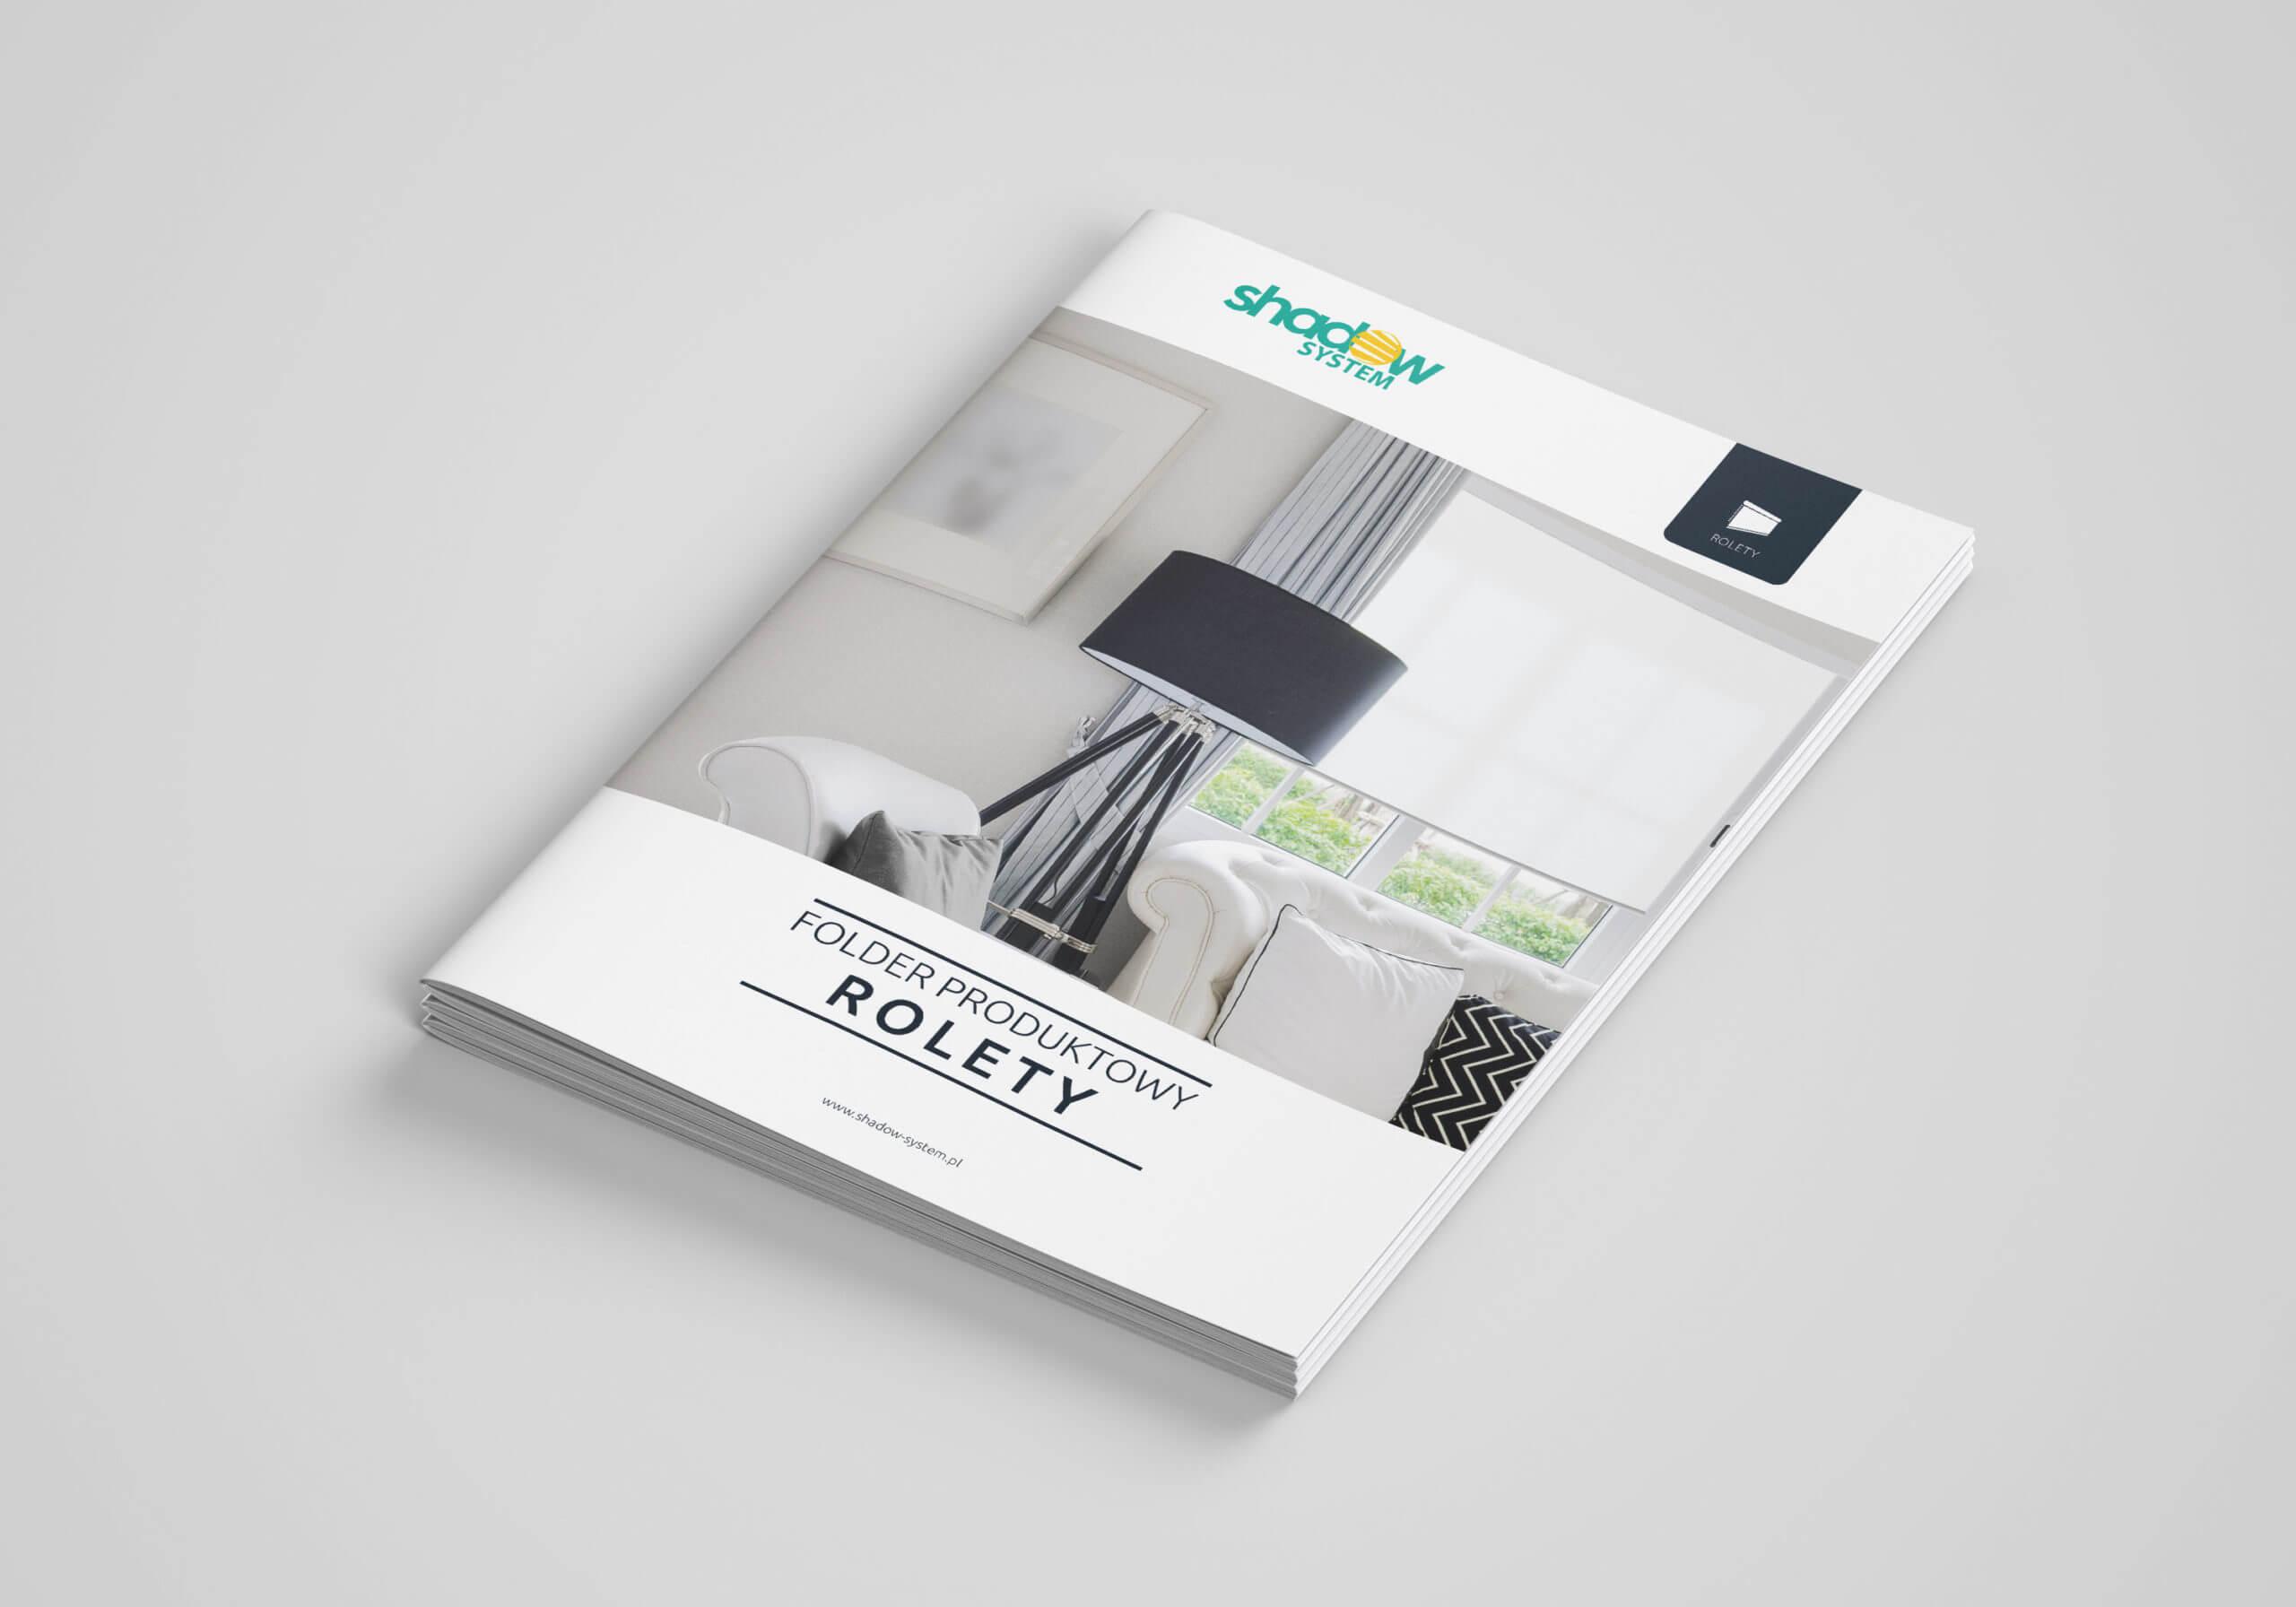 shadow system folder produktowy rolety